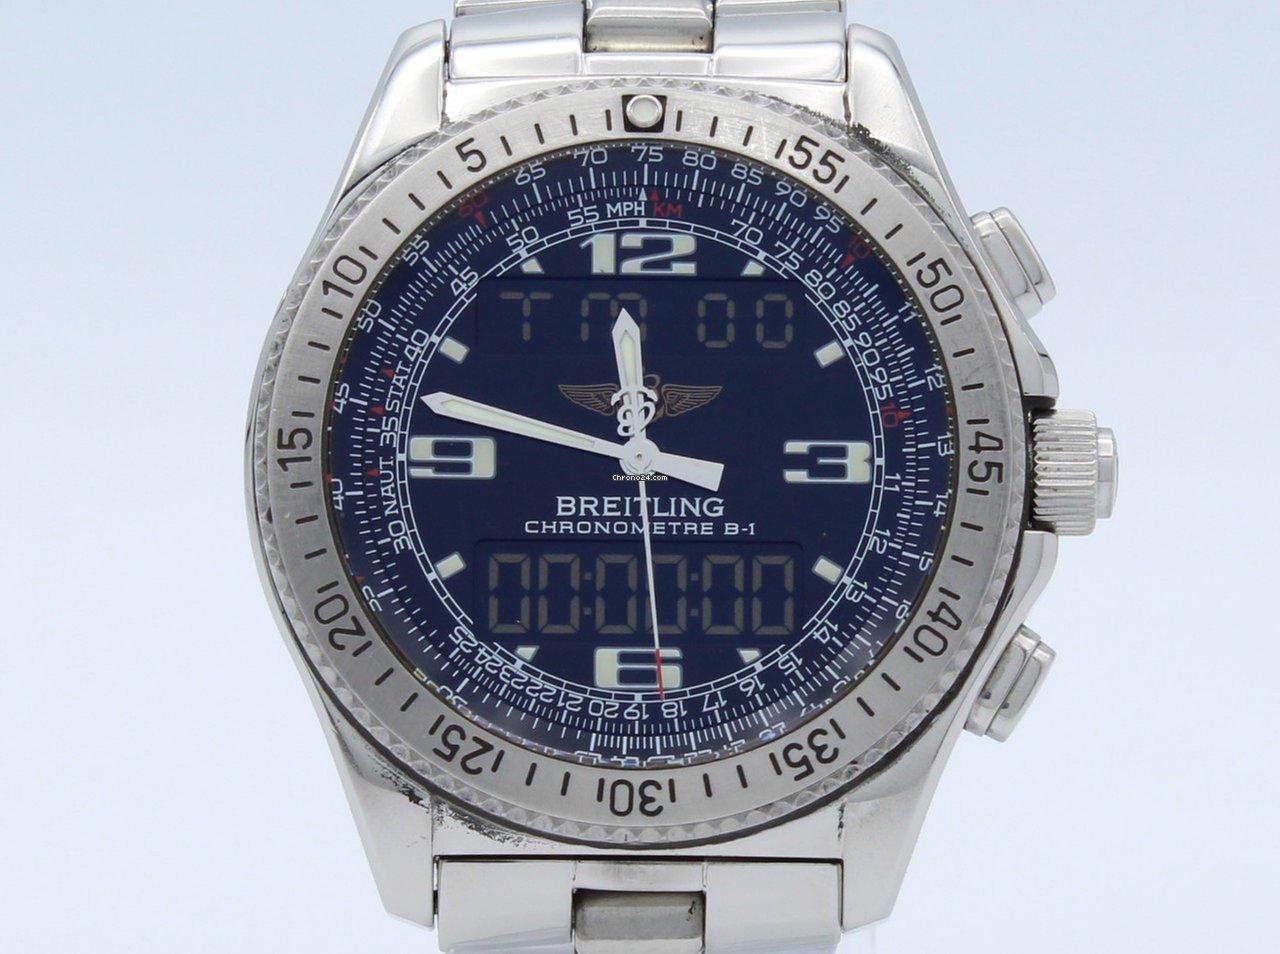 Hodinky Breitling B-1  2d8b8288c4